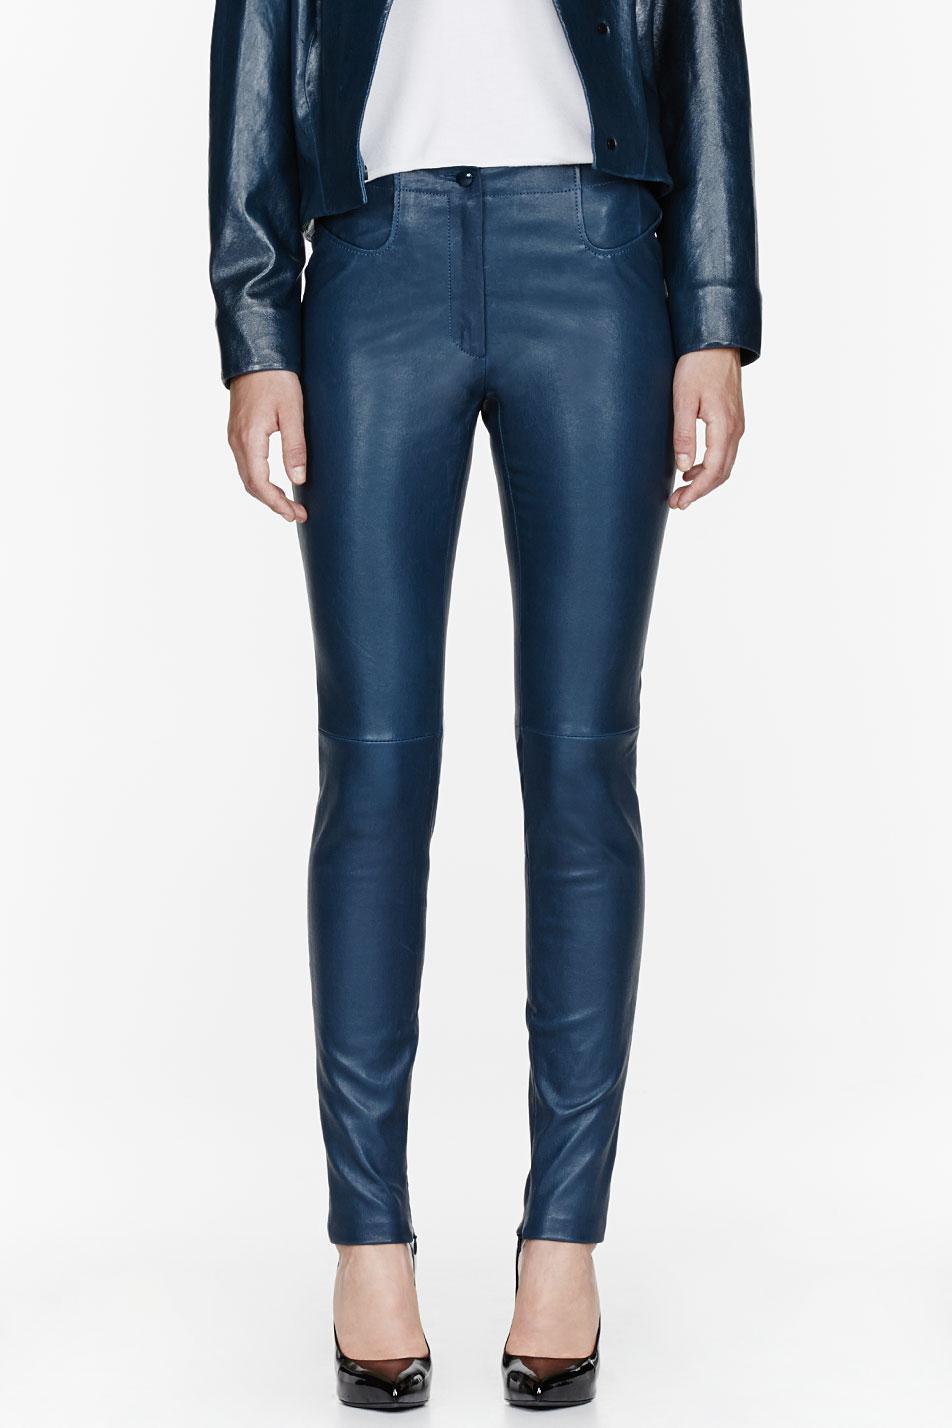 Mugler peacock blue patent leather high waist stretch leggings